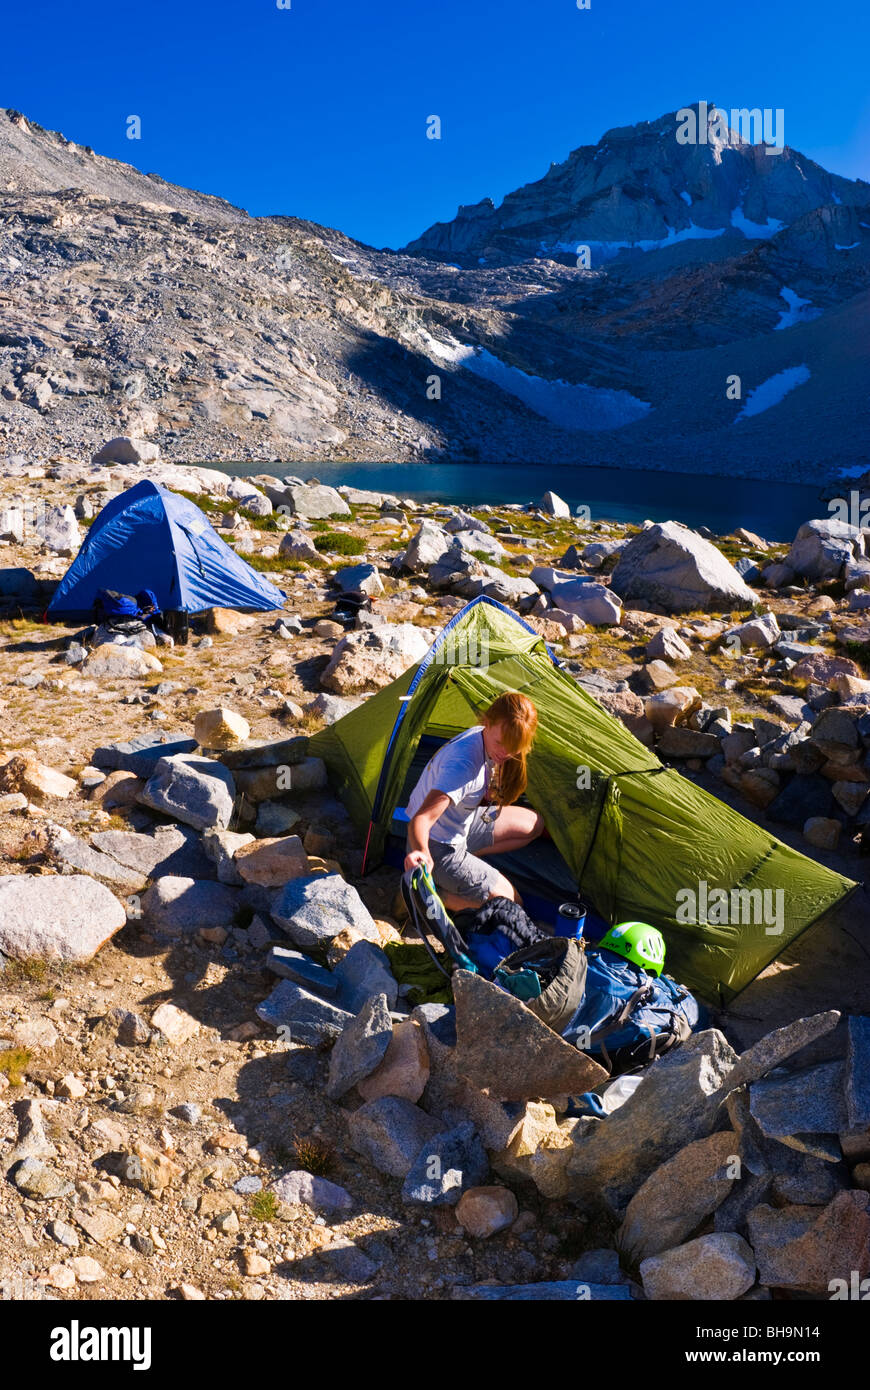 Climber in camp at Dade Lake under Bear Creek Spire, John Muir Wilderness, Sierra Nevada Mountains, California Stock Photo